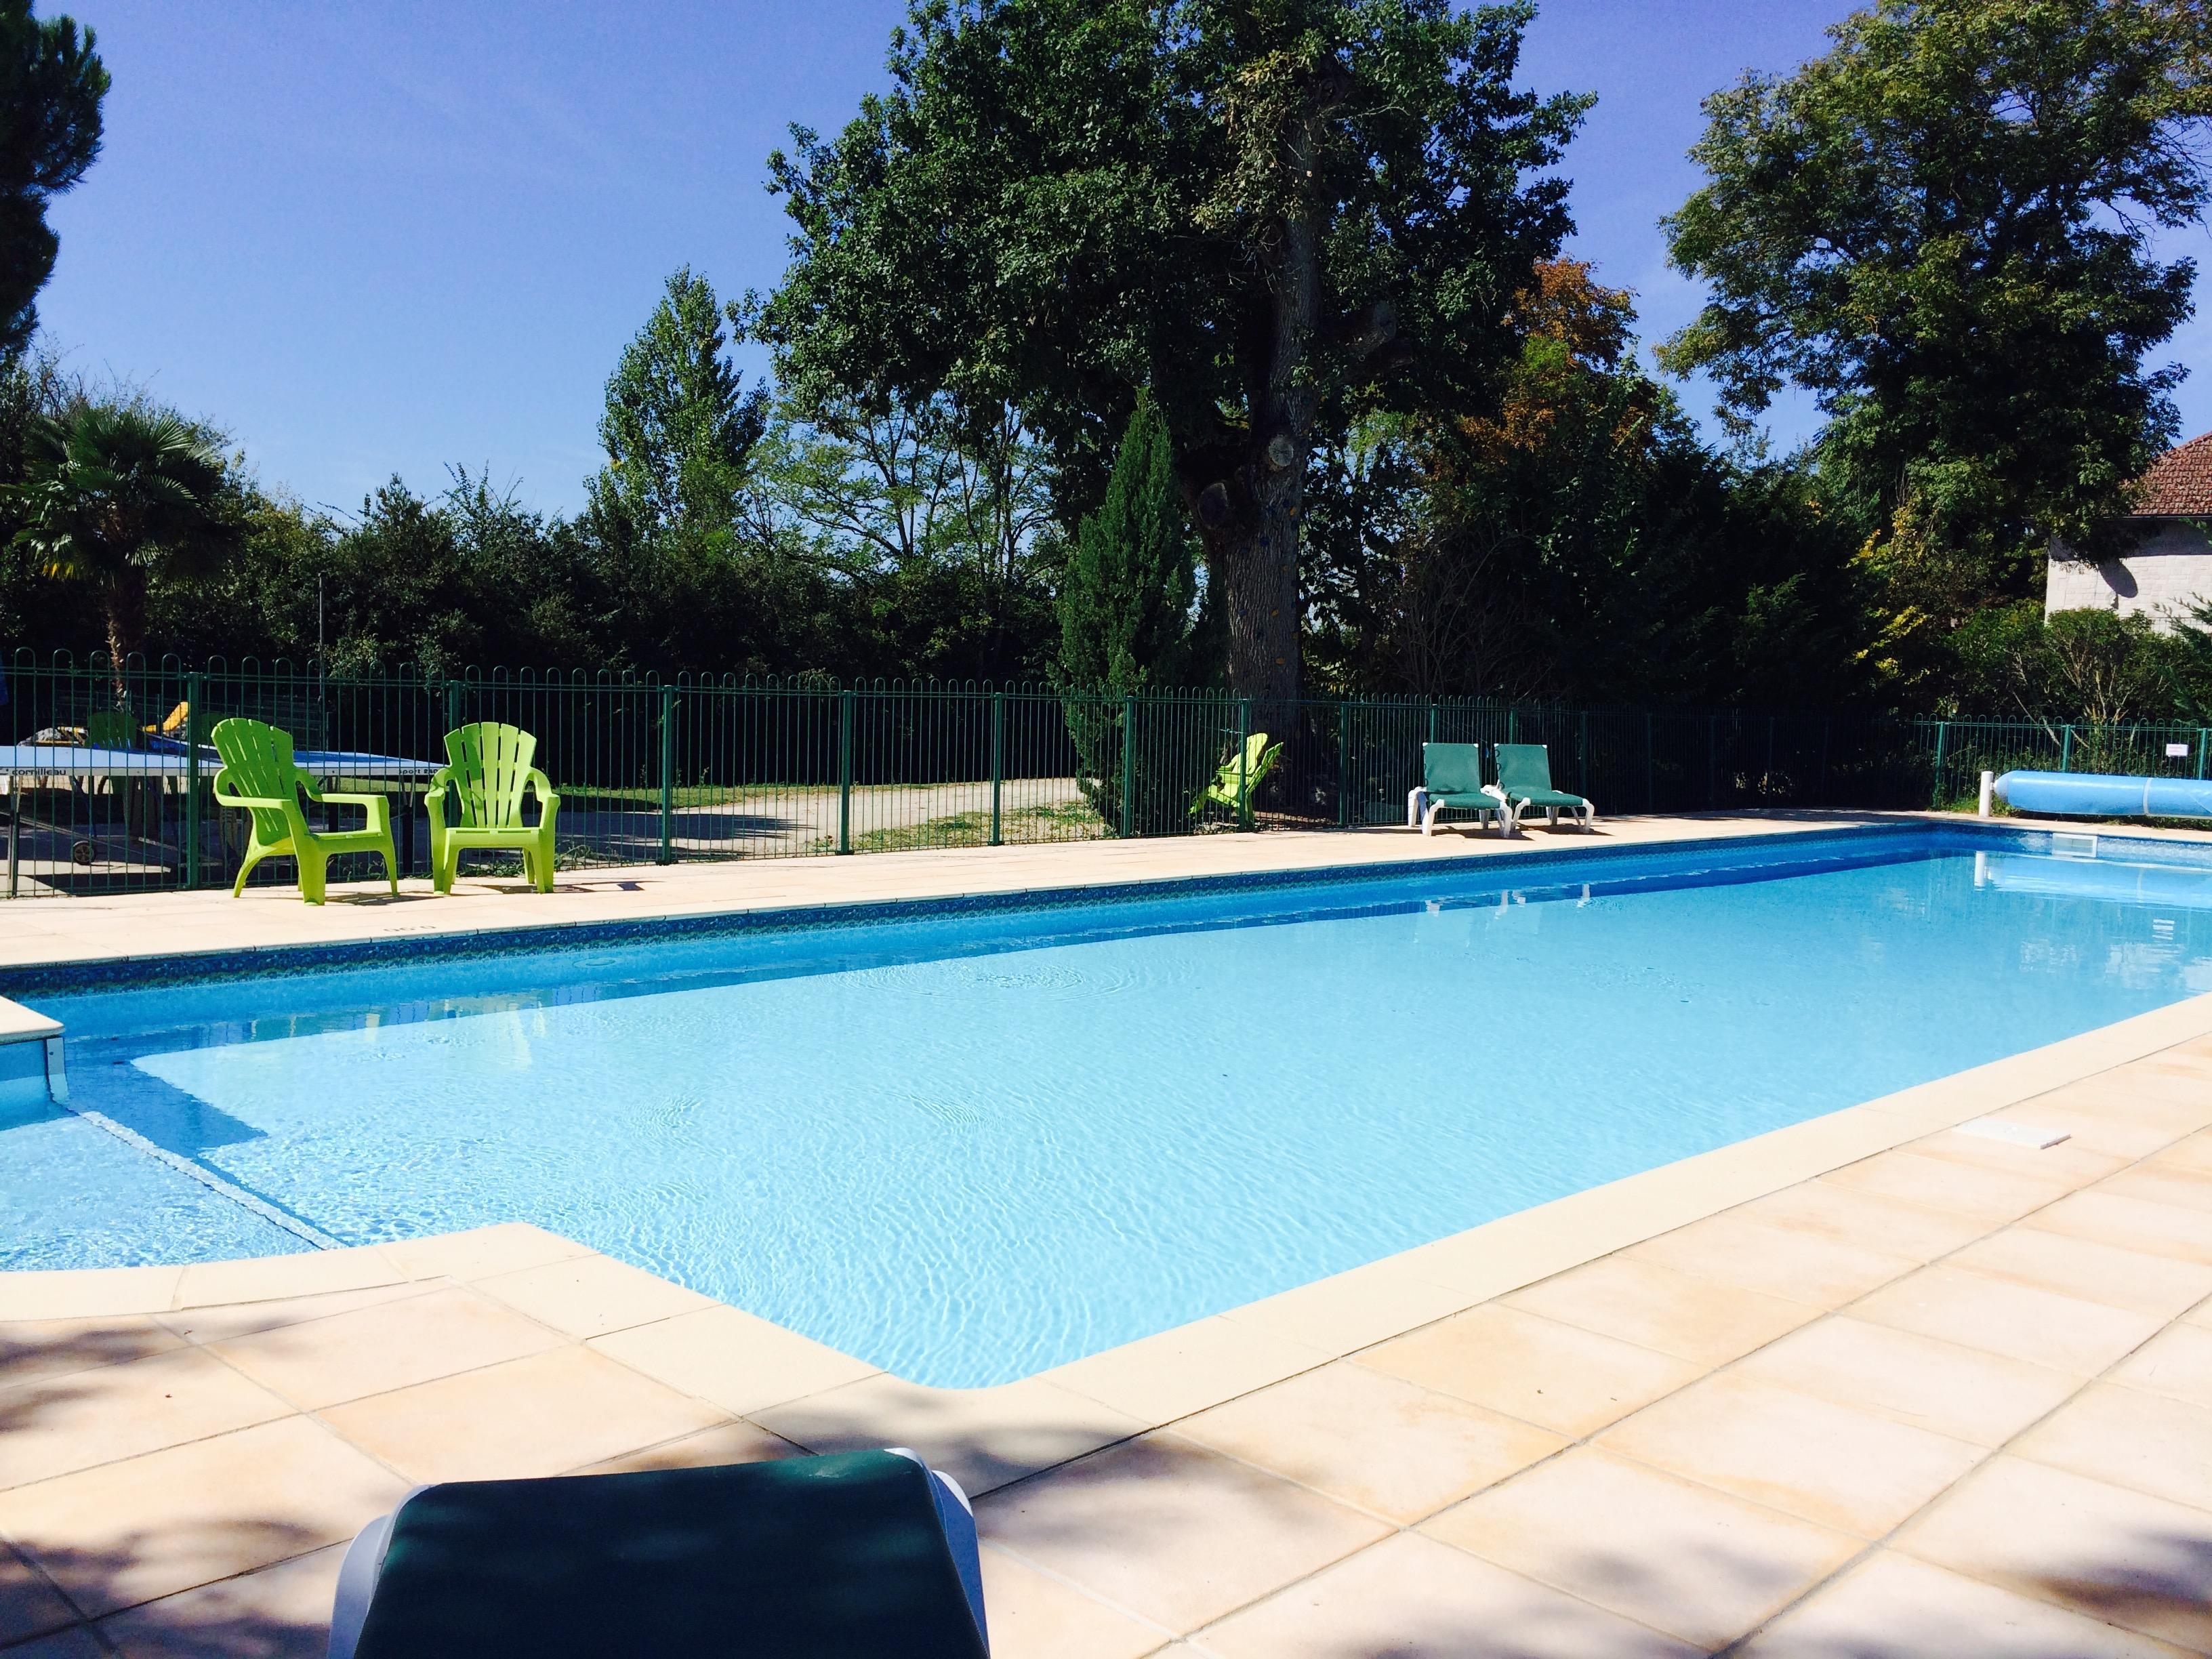 20m pool